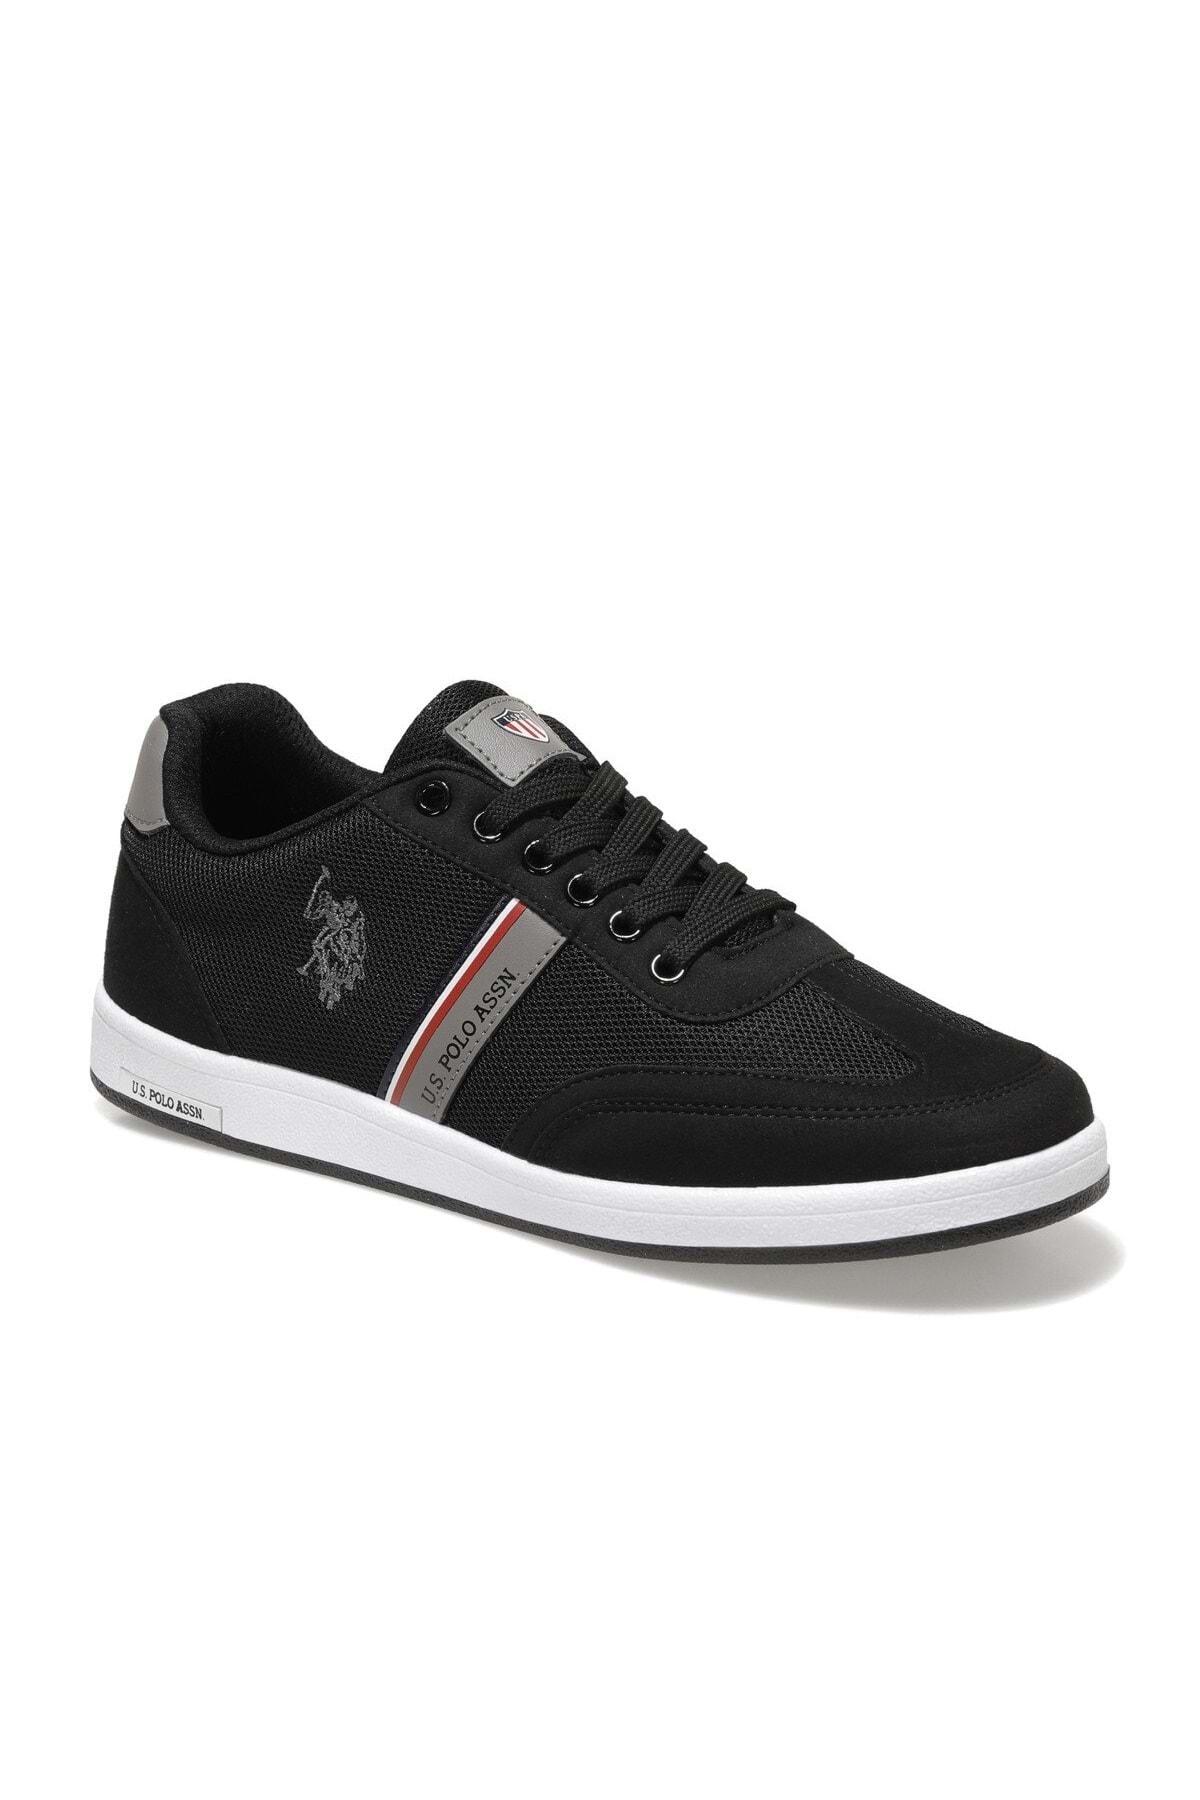 KARES 1FX Siyah Erkek Sneaker Ayakkabı 100910454